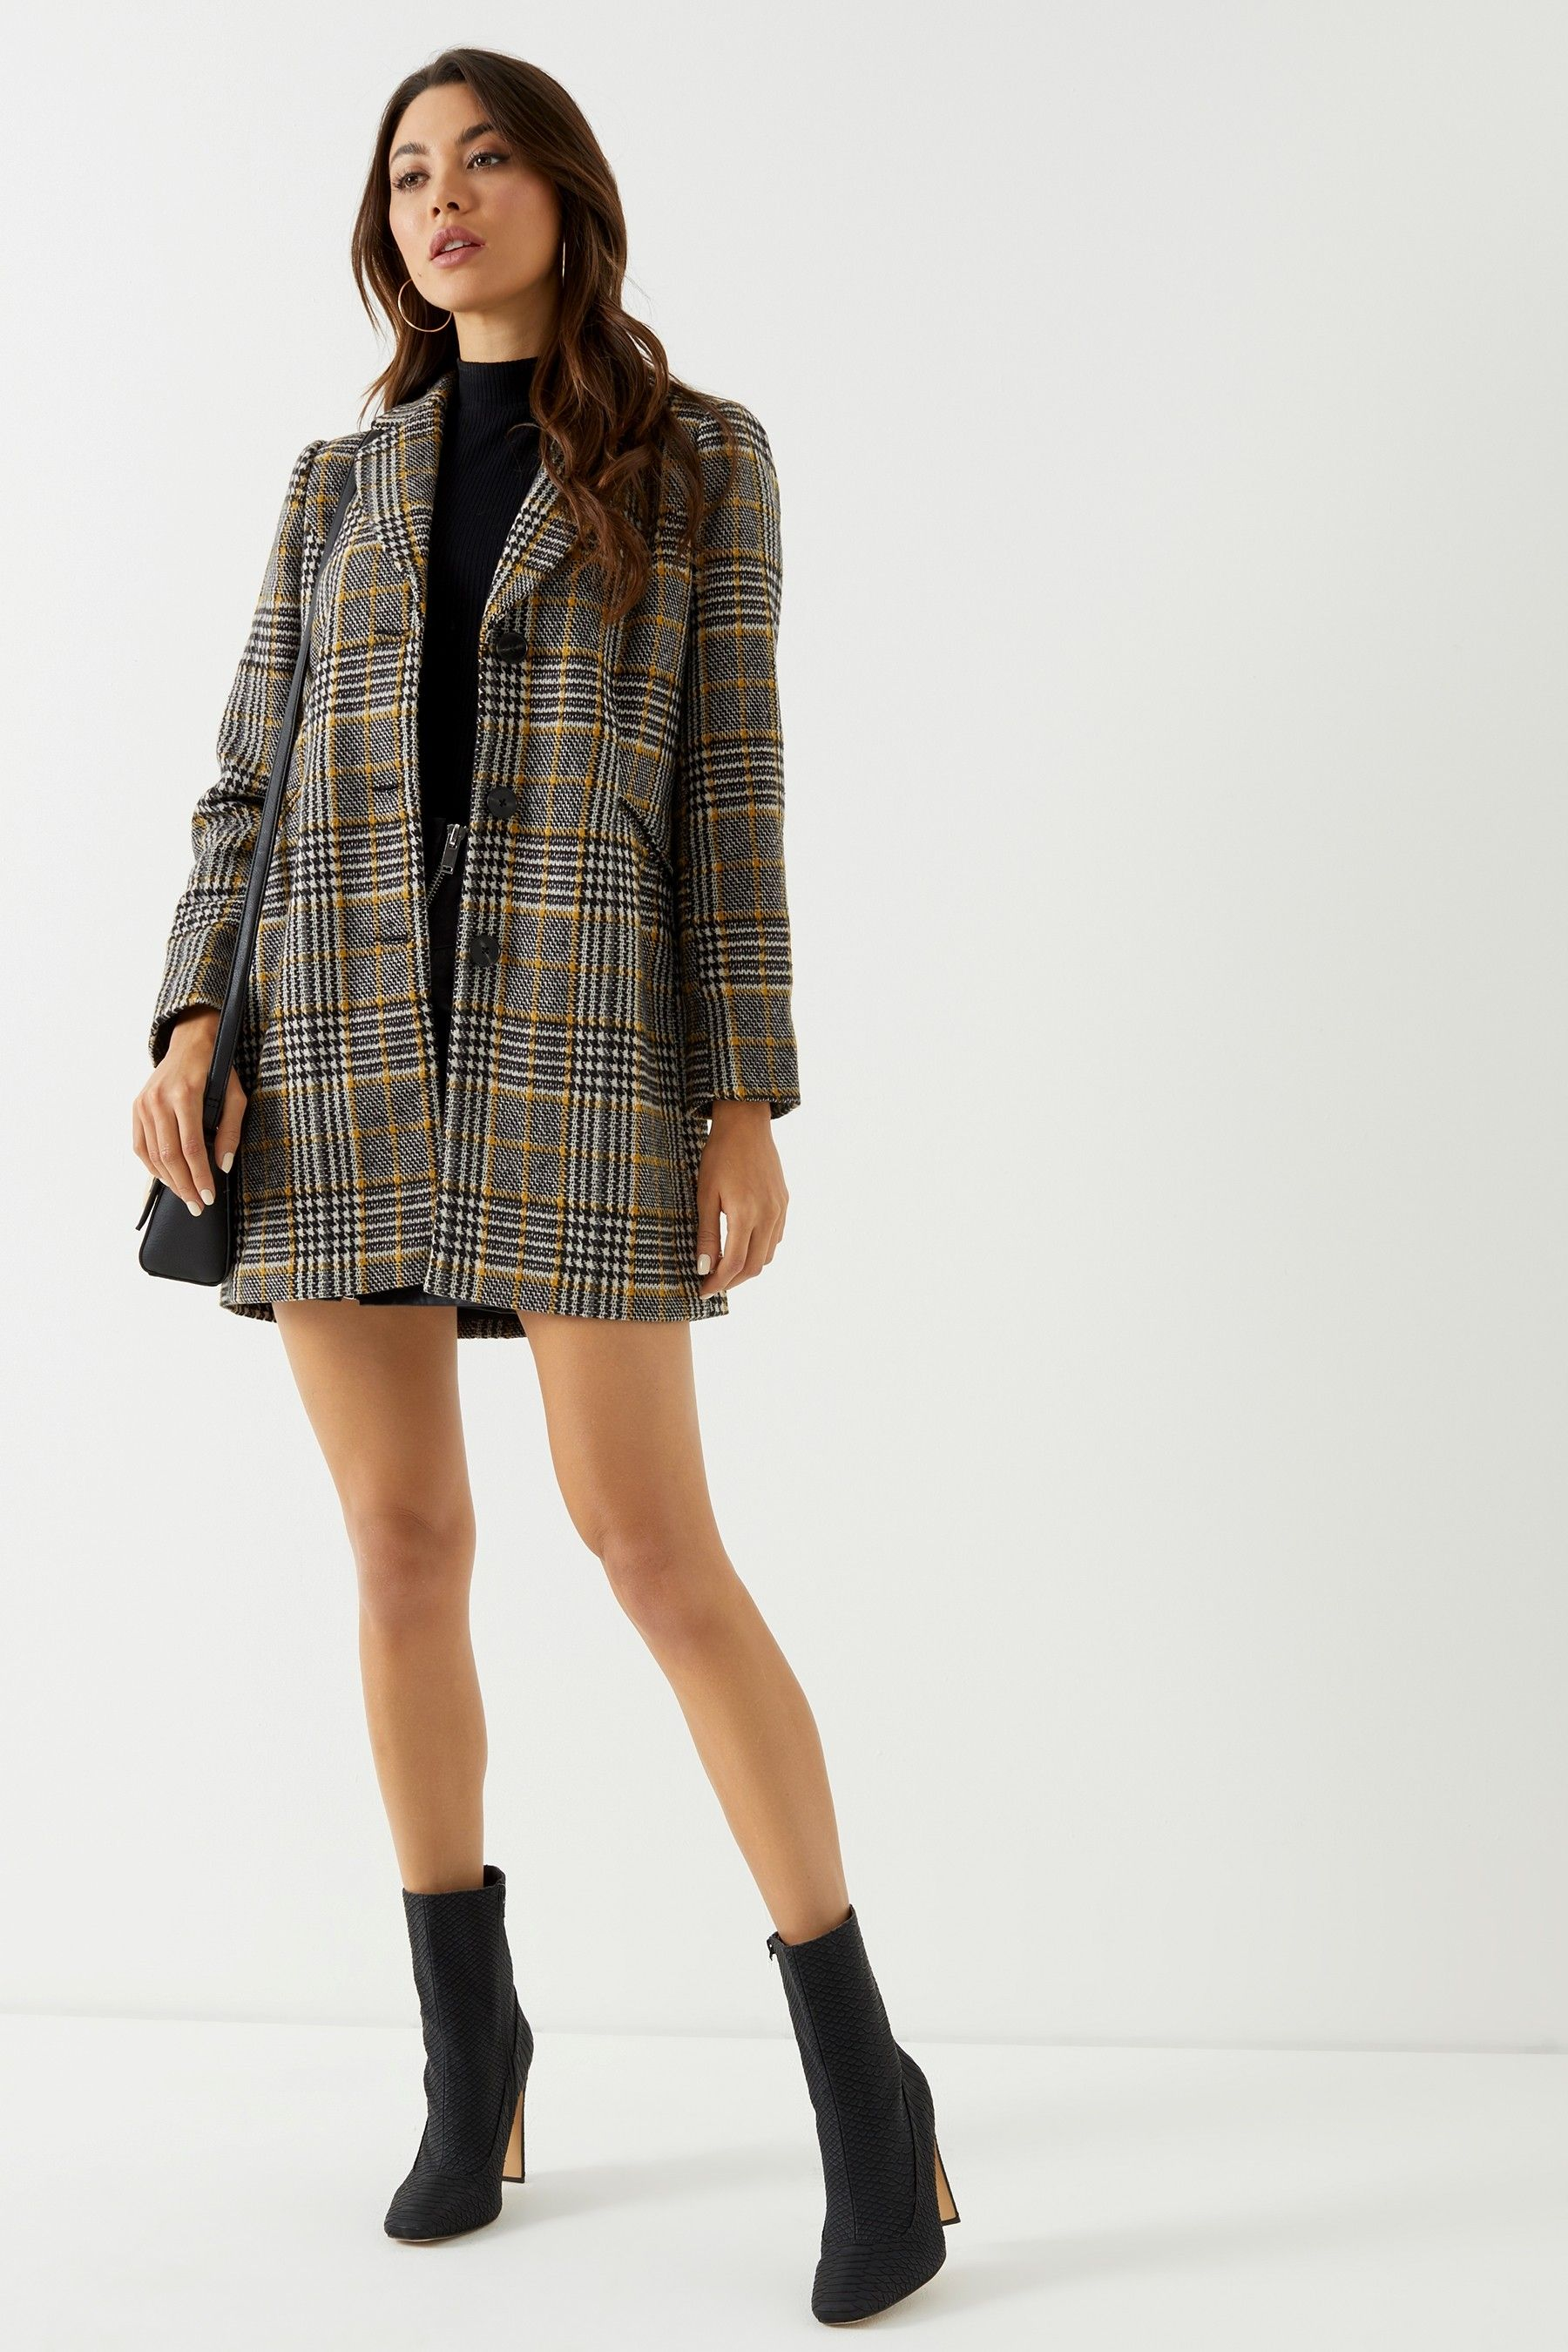 b6a80fb43beb Buy Vero Moda Petite Check Wool Jacket from the Next UK online shop ...